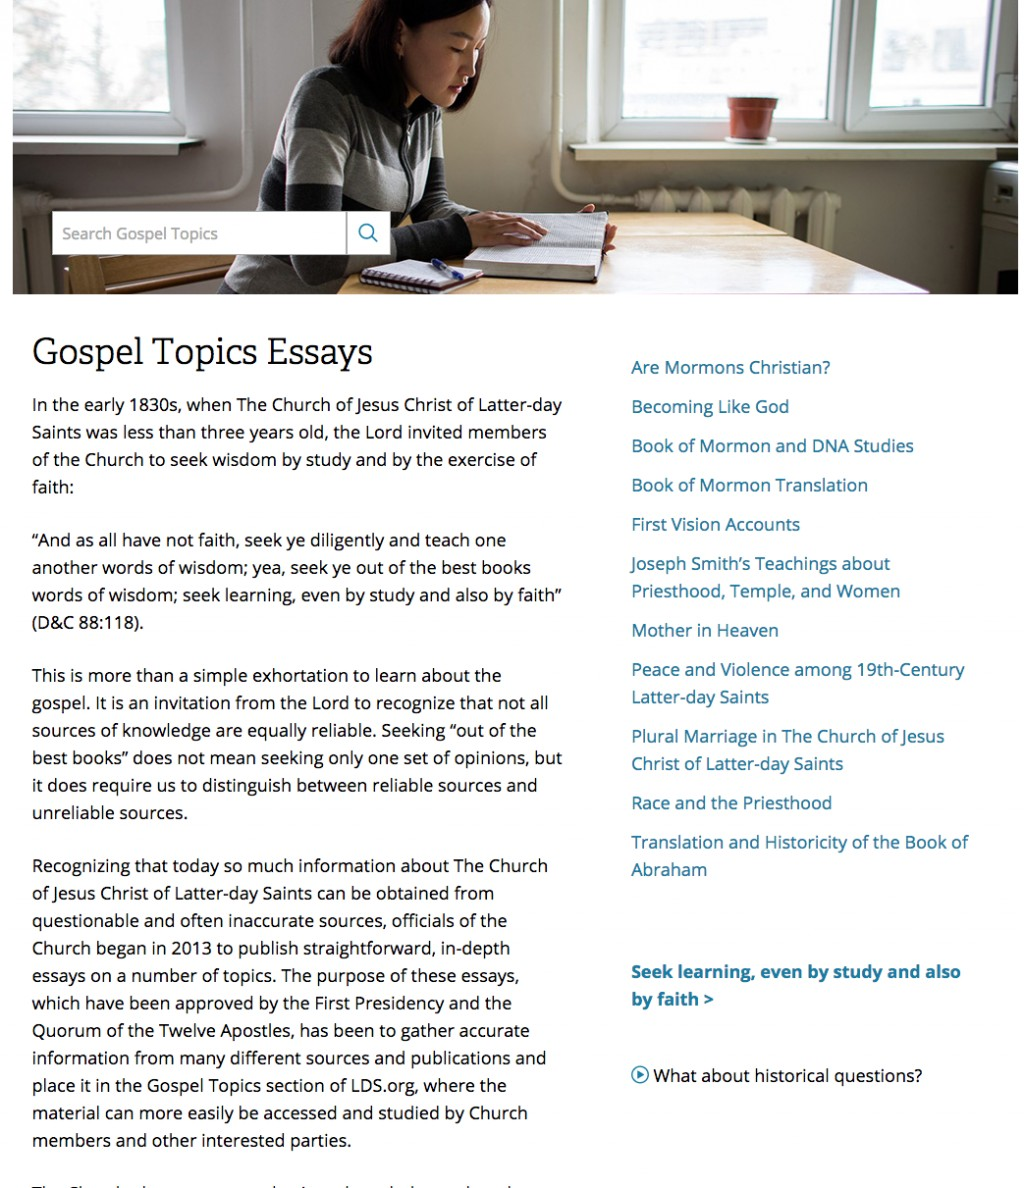 014 Screen20shot202016 1620at208 0920pm Gospel Topics Essays Essay Outstanding Book Of Abraham Pdf Mormon Translation Large